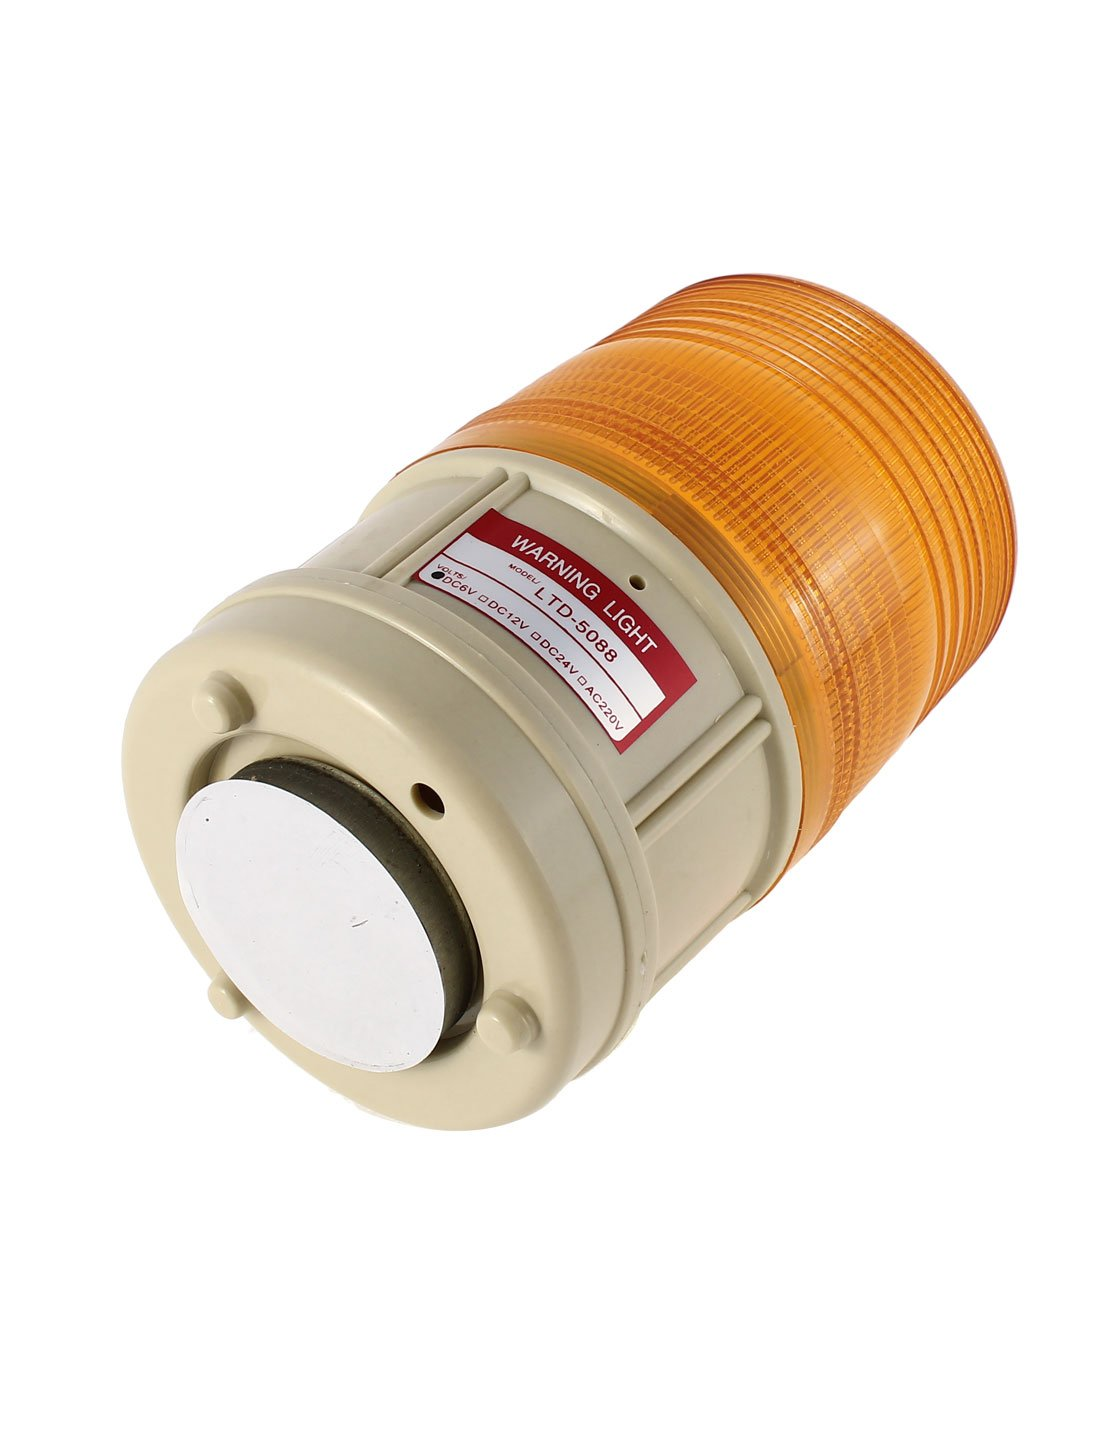 Gelb de magnetisch Industrial DC6 V-Notfall-Warnleuchte